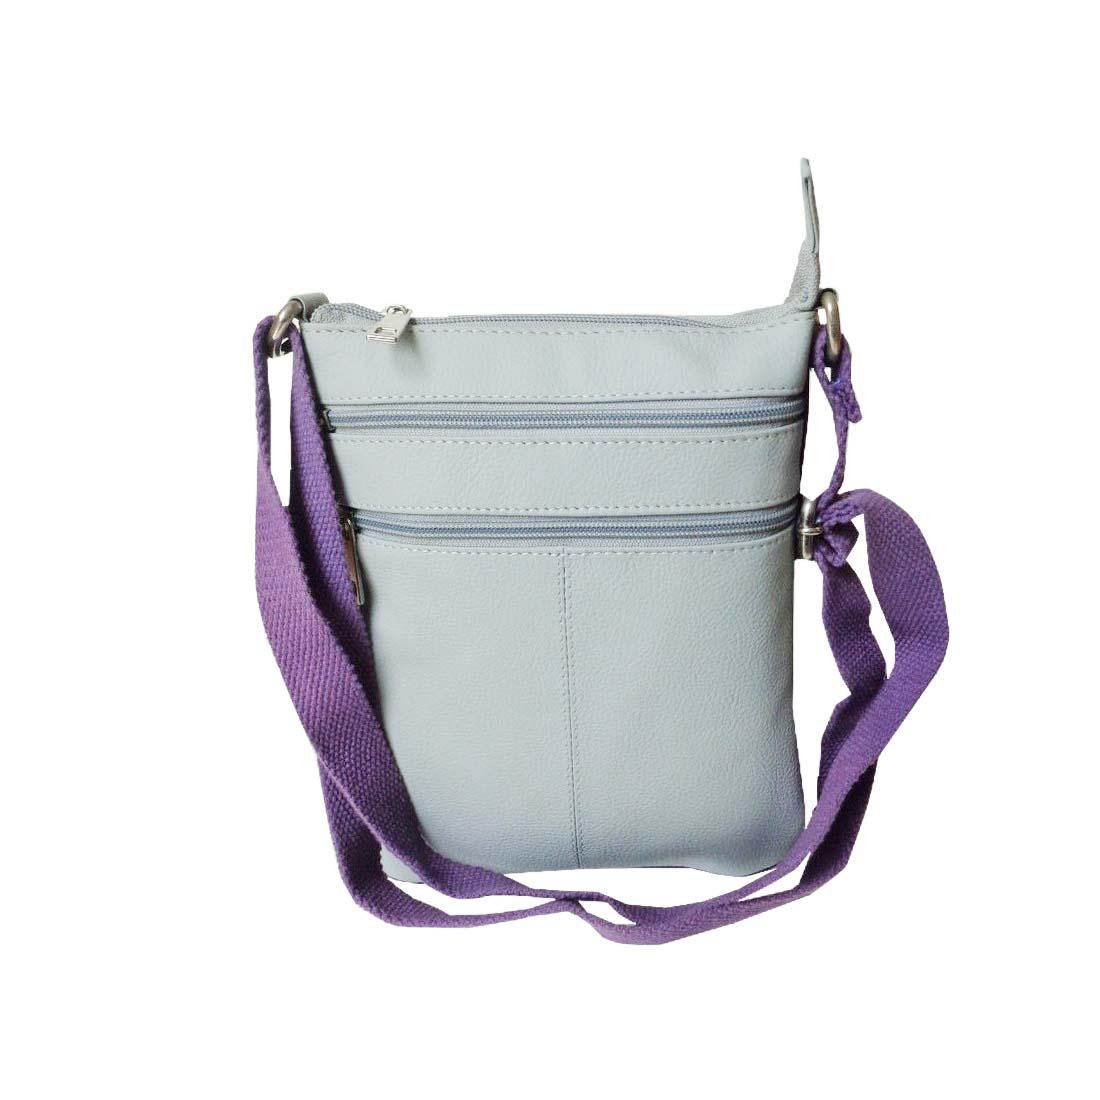 Style 98 Womens Sling Bag HandBag Messenger Bags Satchel Bag   Light Grey 3005IT